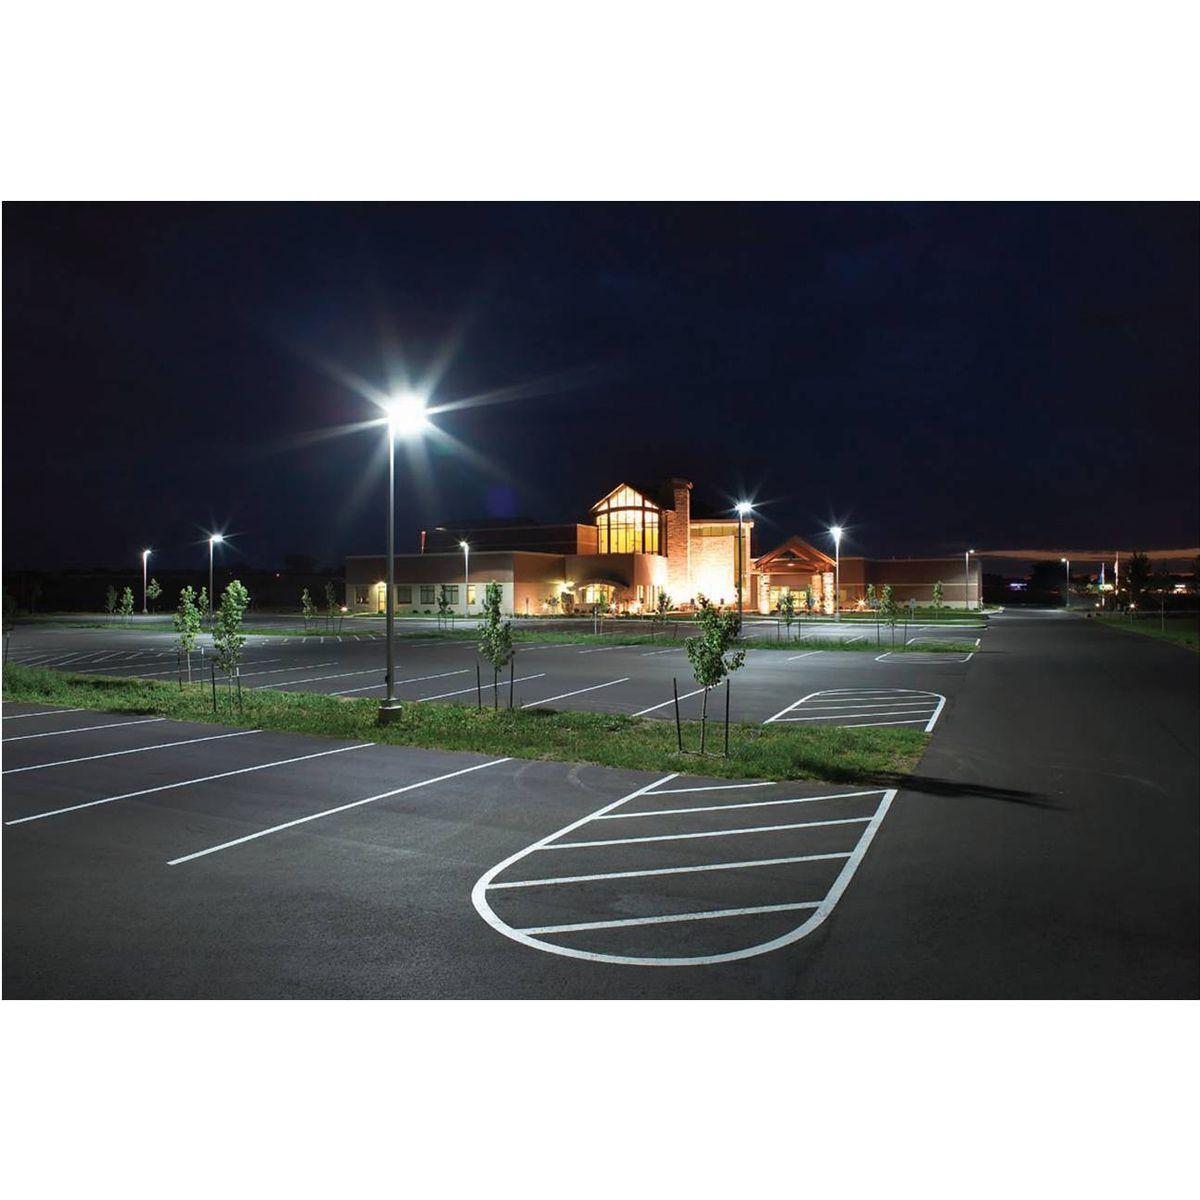 Super Bright 100w 11000lm Daylight White Led Parking Lot Lights With Slip Fitter Waterproof 250w Hps Equiv Waterproof Shoebox Light For Docks Driveways Backyards 5000k Daylight White Dlc Ul Listed In 2020